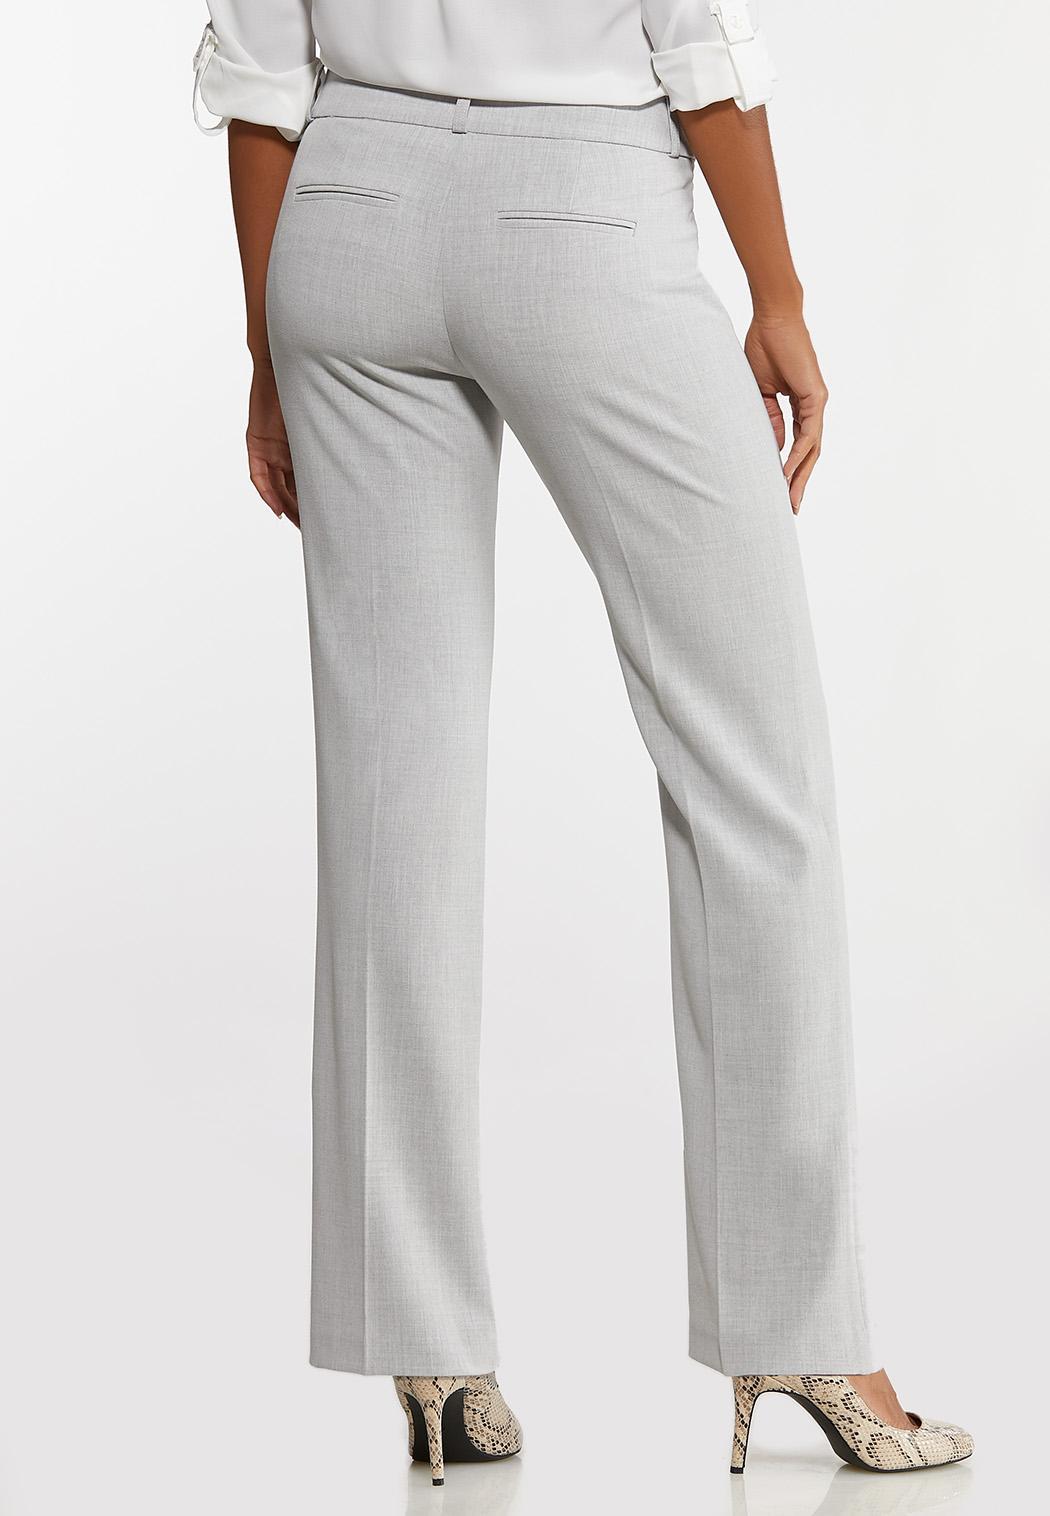 Gray Trouser Pants (Item #44474556)